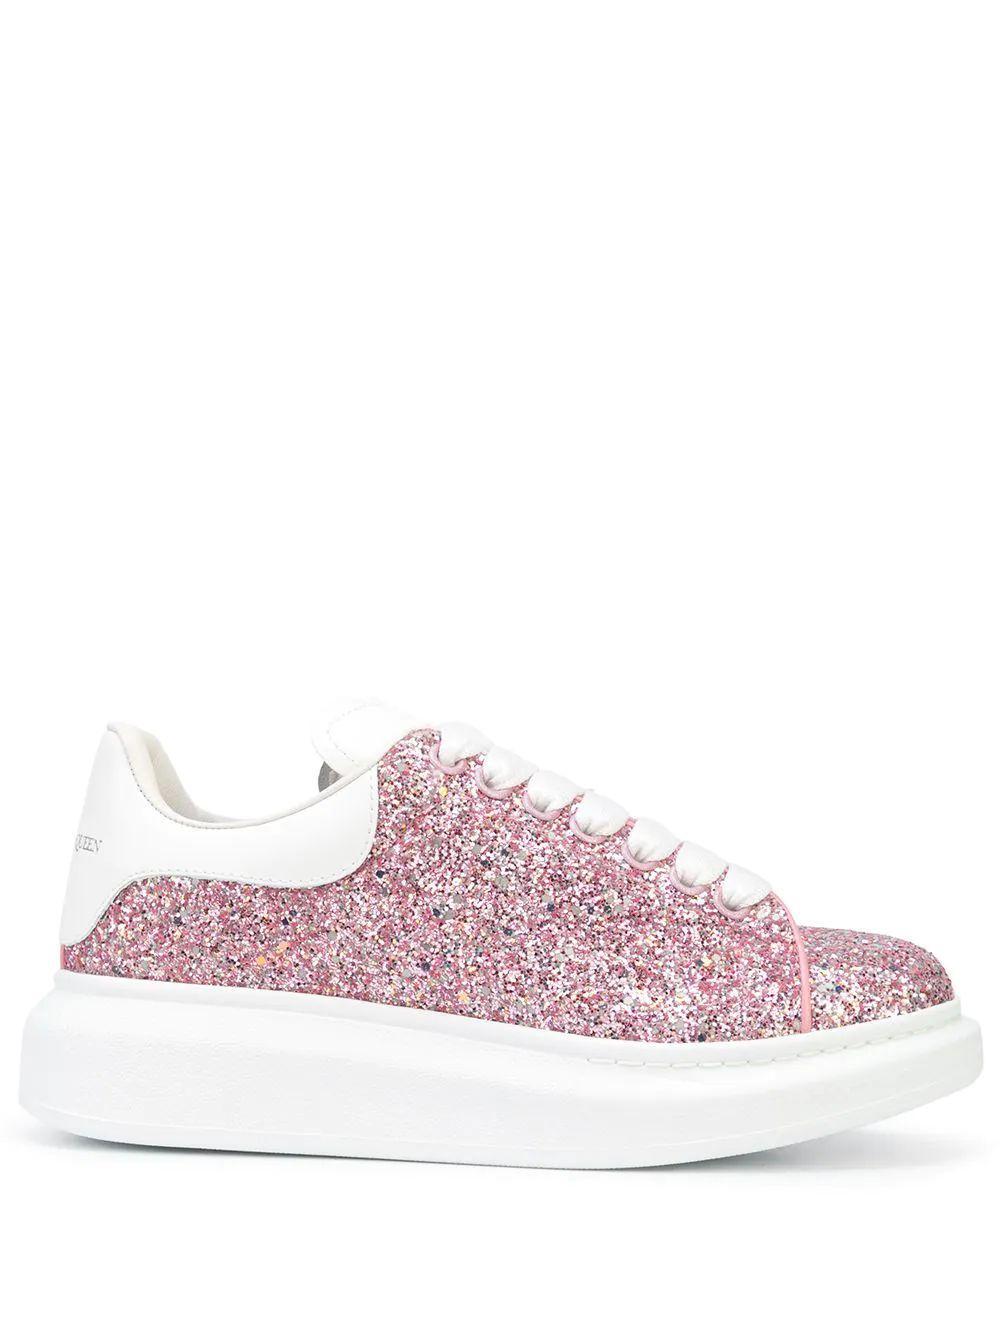 All Over Glitter Platform Sneaker Item # 621062W4RN1